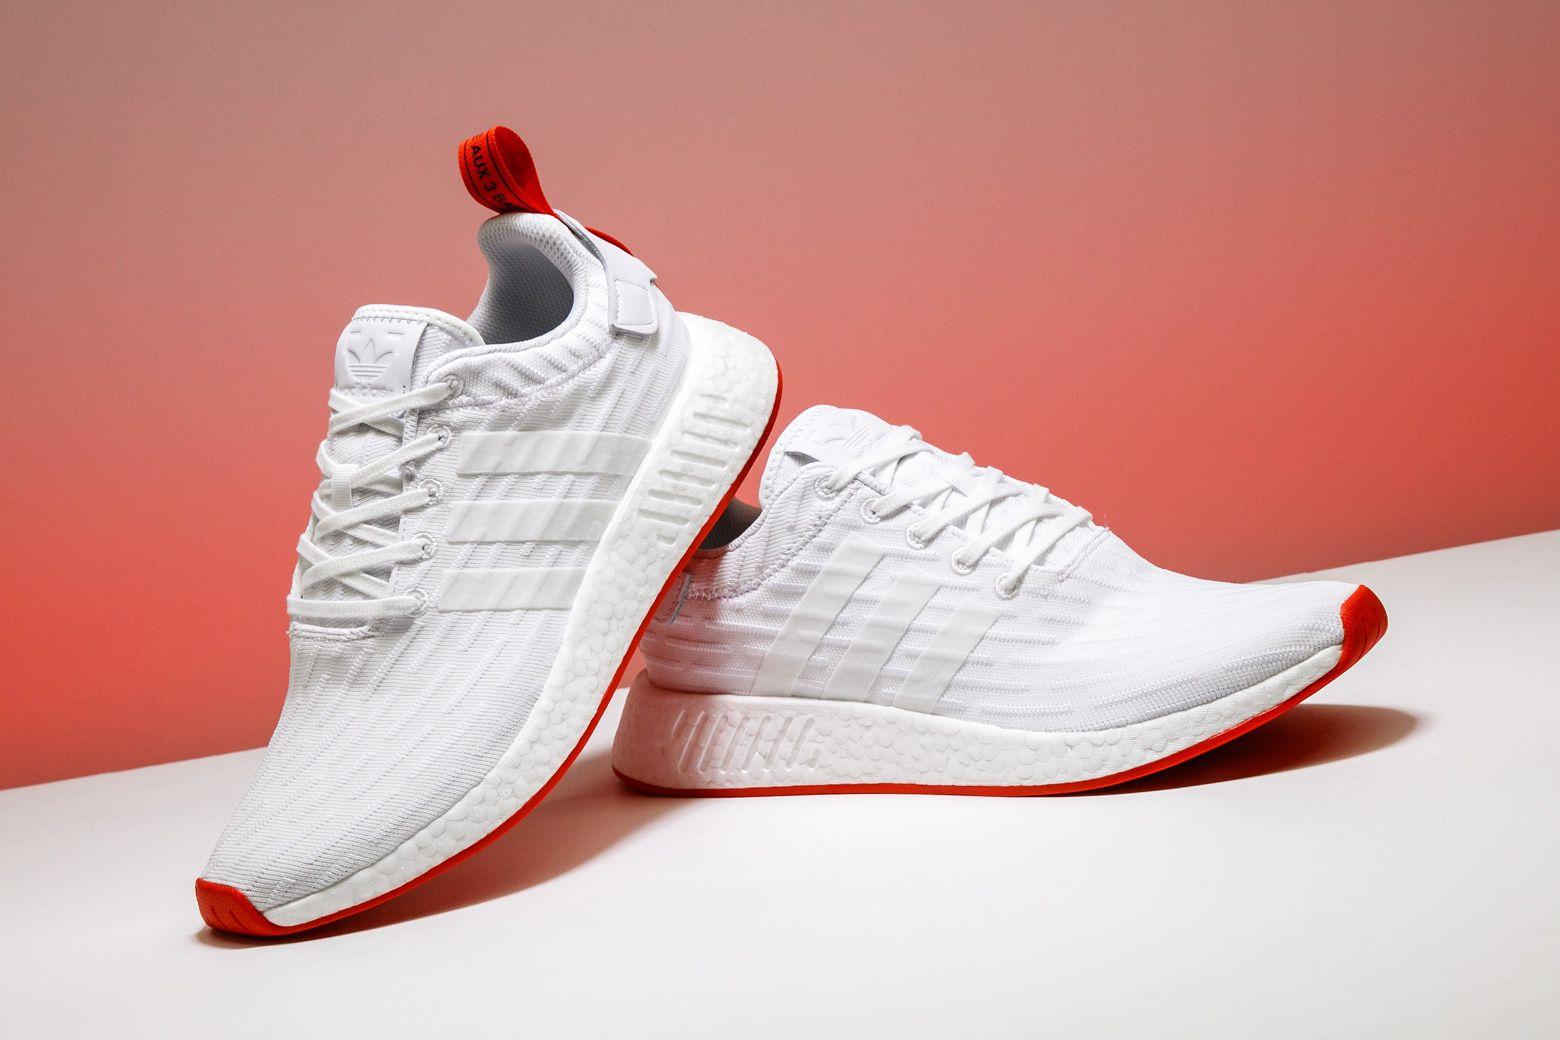 online retailer edce9 20989 Adidas NMD_R2 PK - BA7253 in 2019 | adidas NMD | Adidas nmd ...